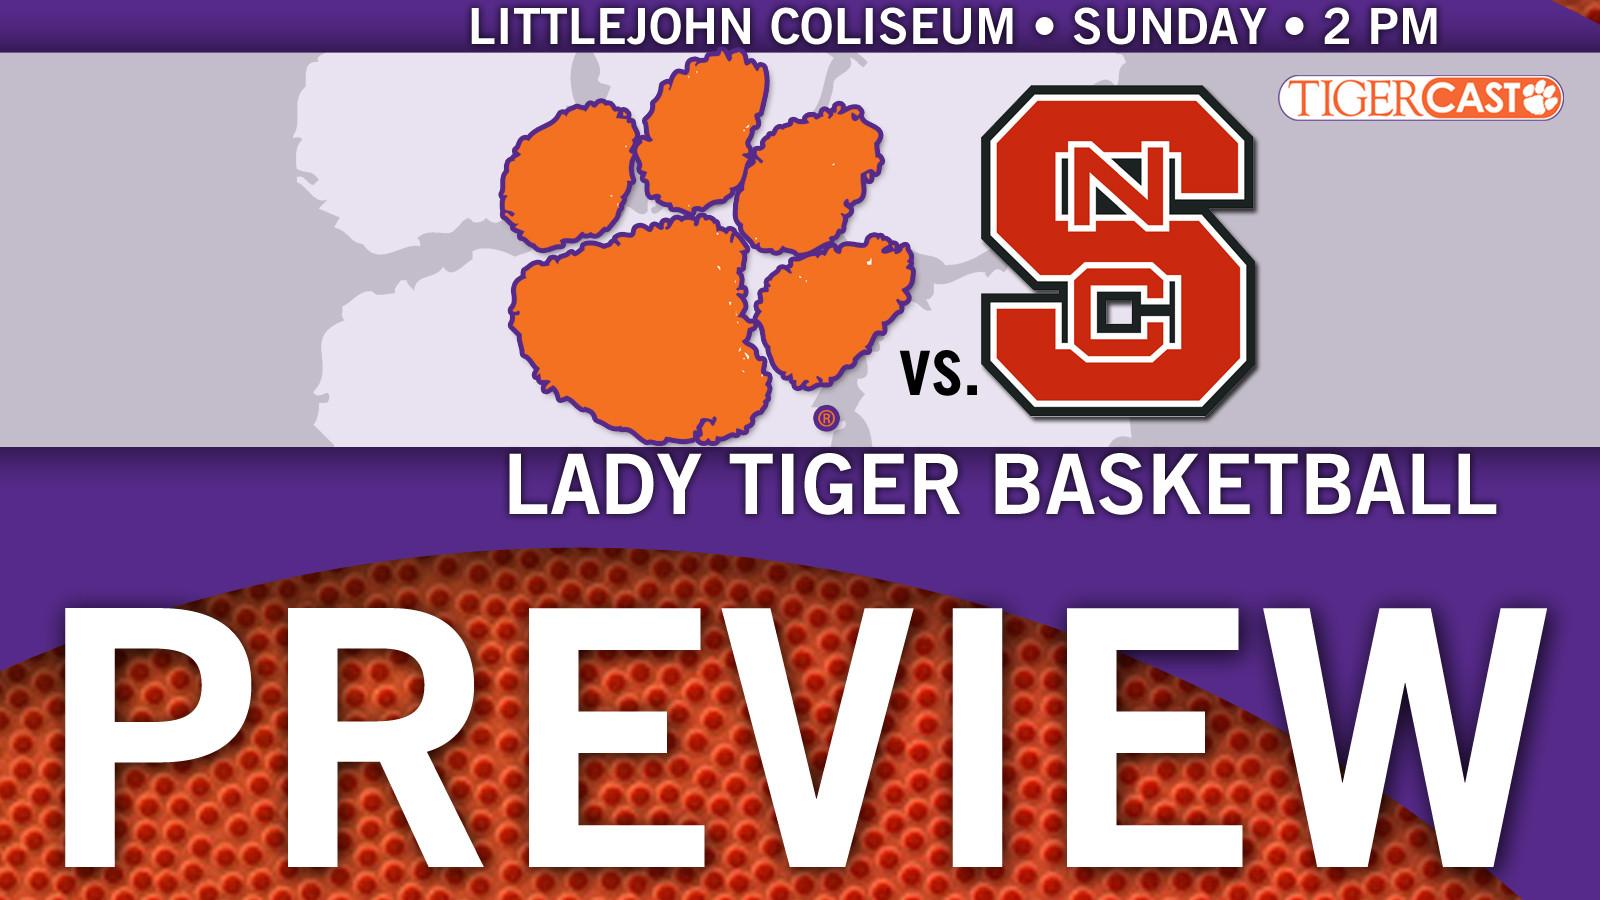 Lady Tigers Close Regular Season in Littlejohn on Sunday